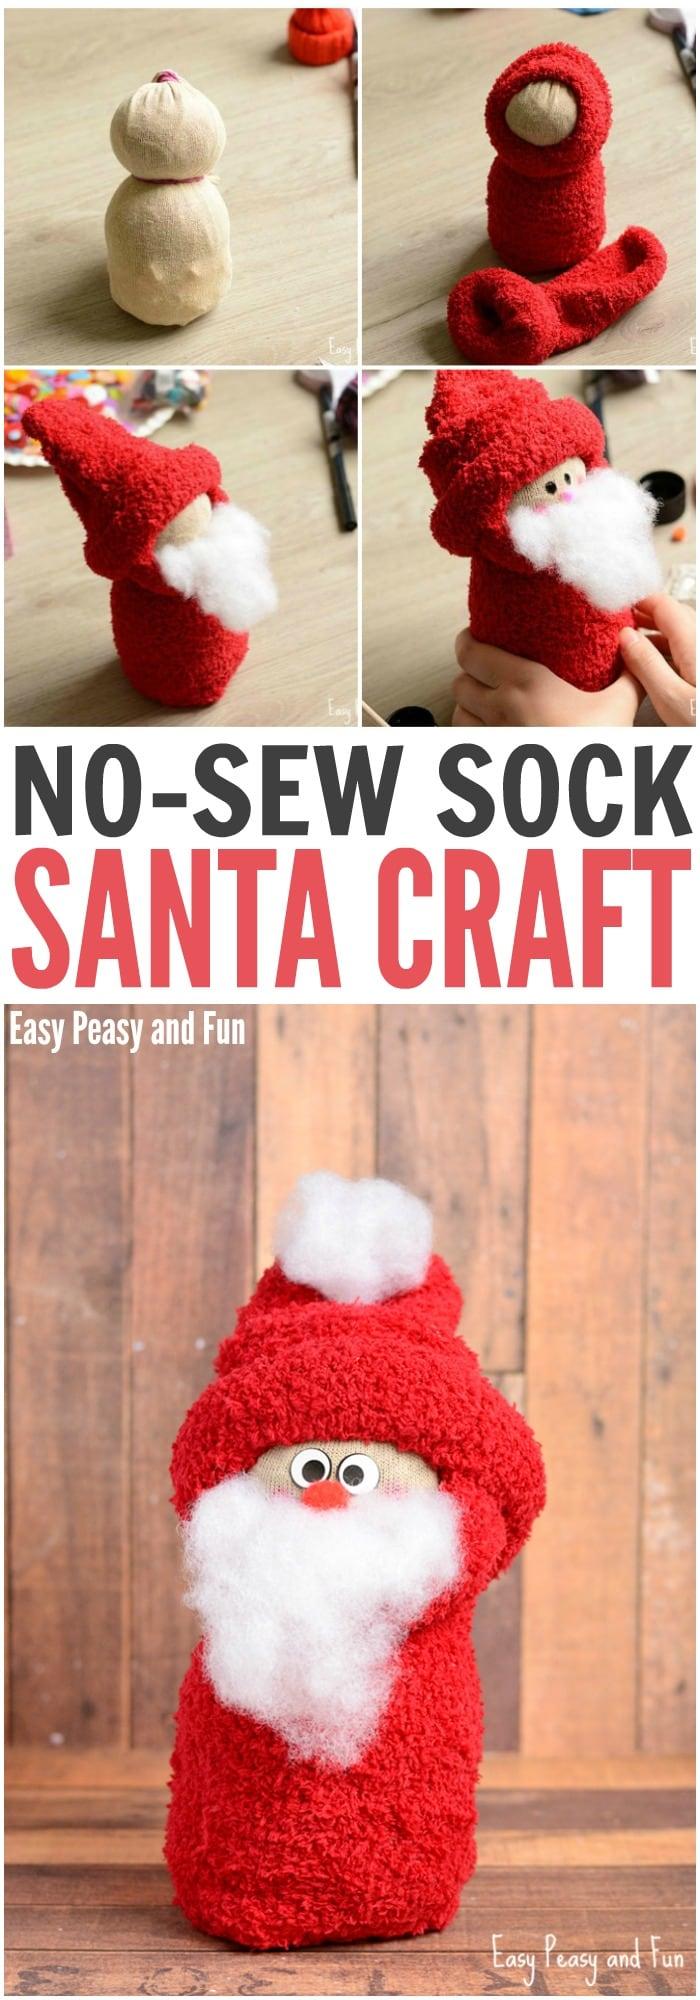 No Sew Sock Santa Craft Easy Peasy And Fun